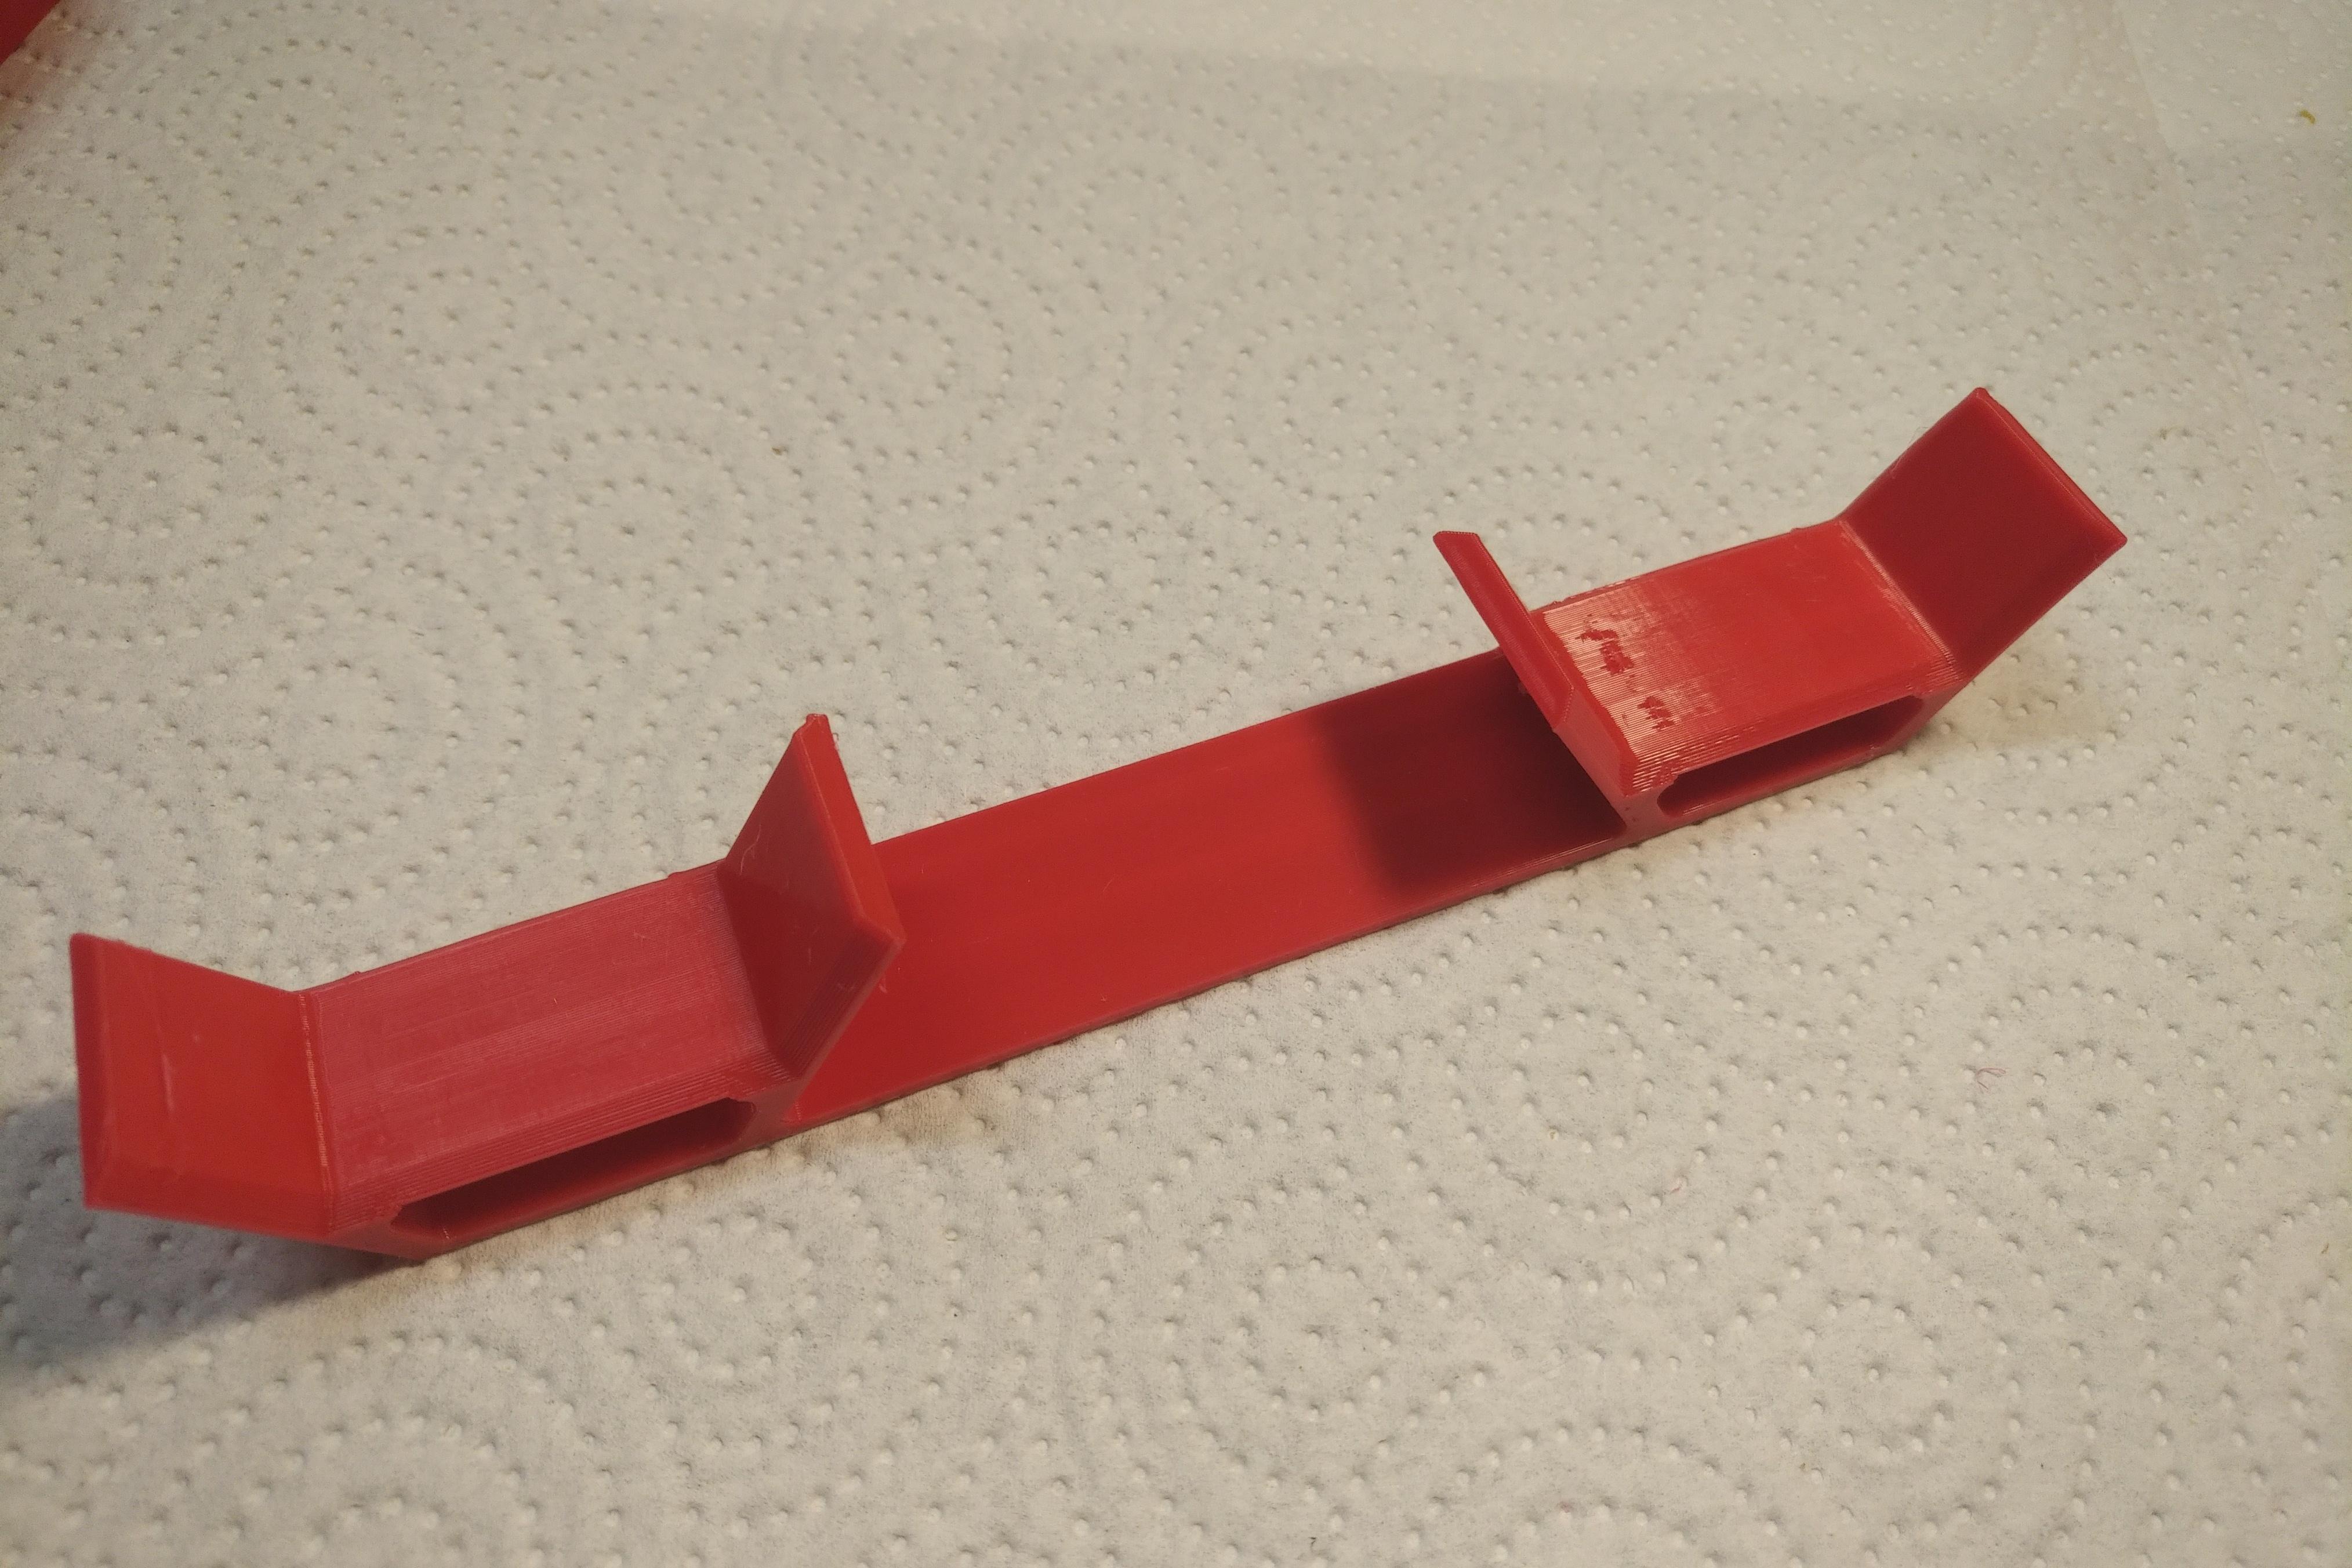 IMG_20210103_1805586.jpg Download STL file Modular Spice Rack • 3D printable template, TimBauer-TB3Dprint